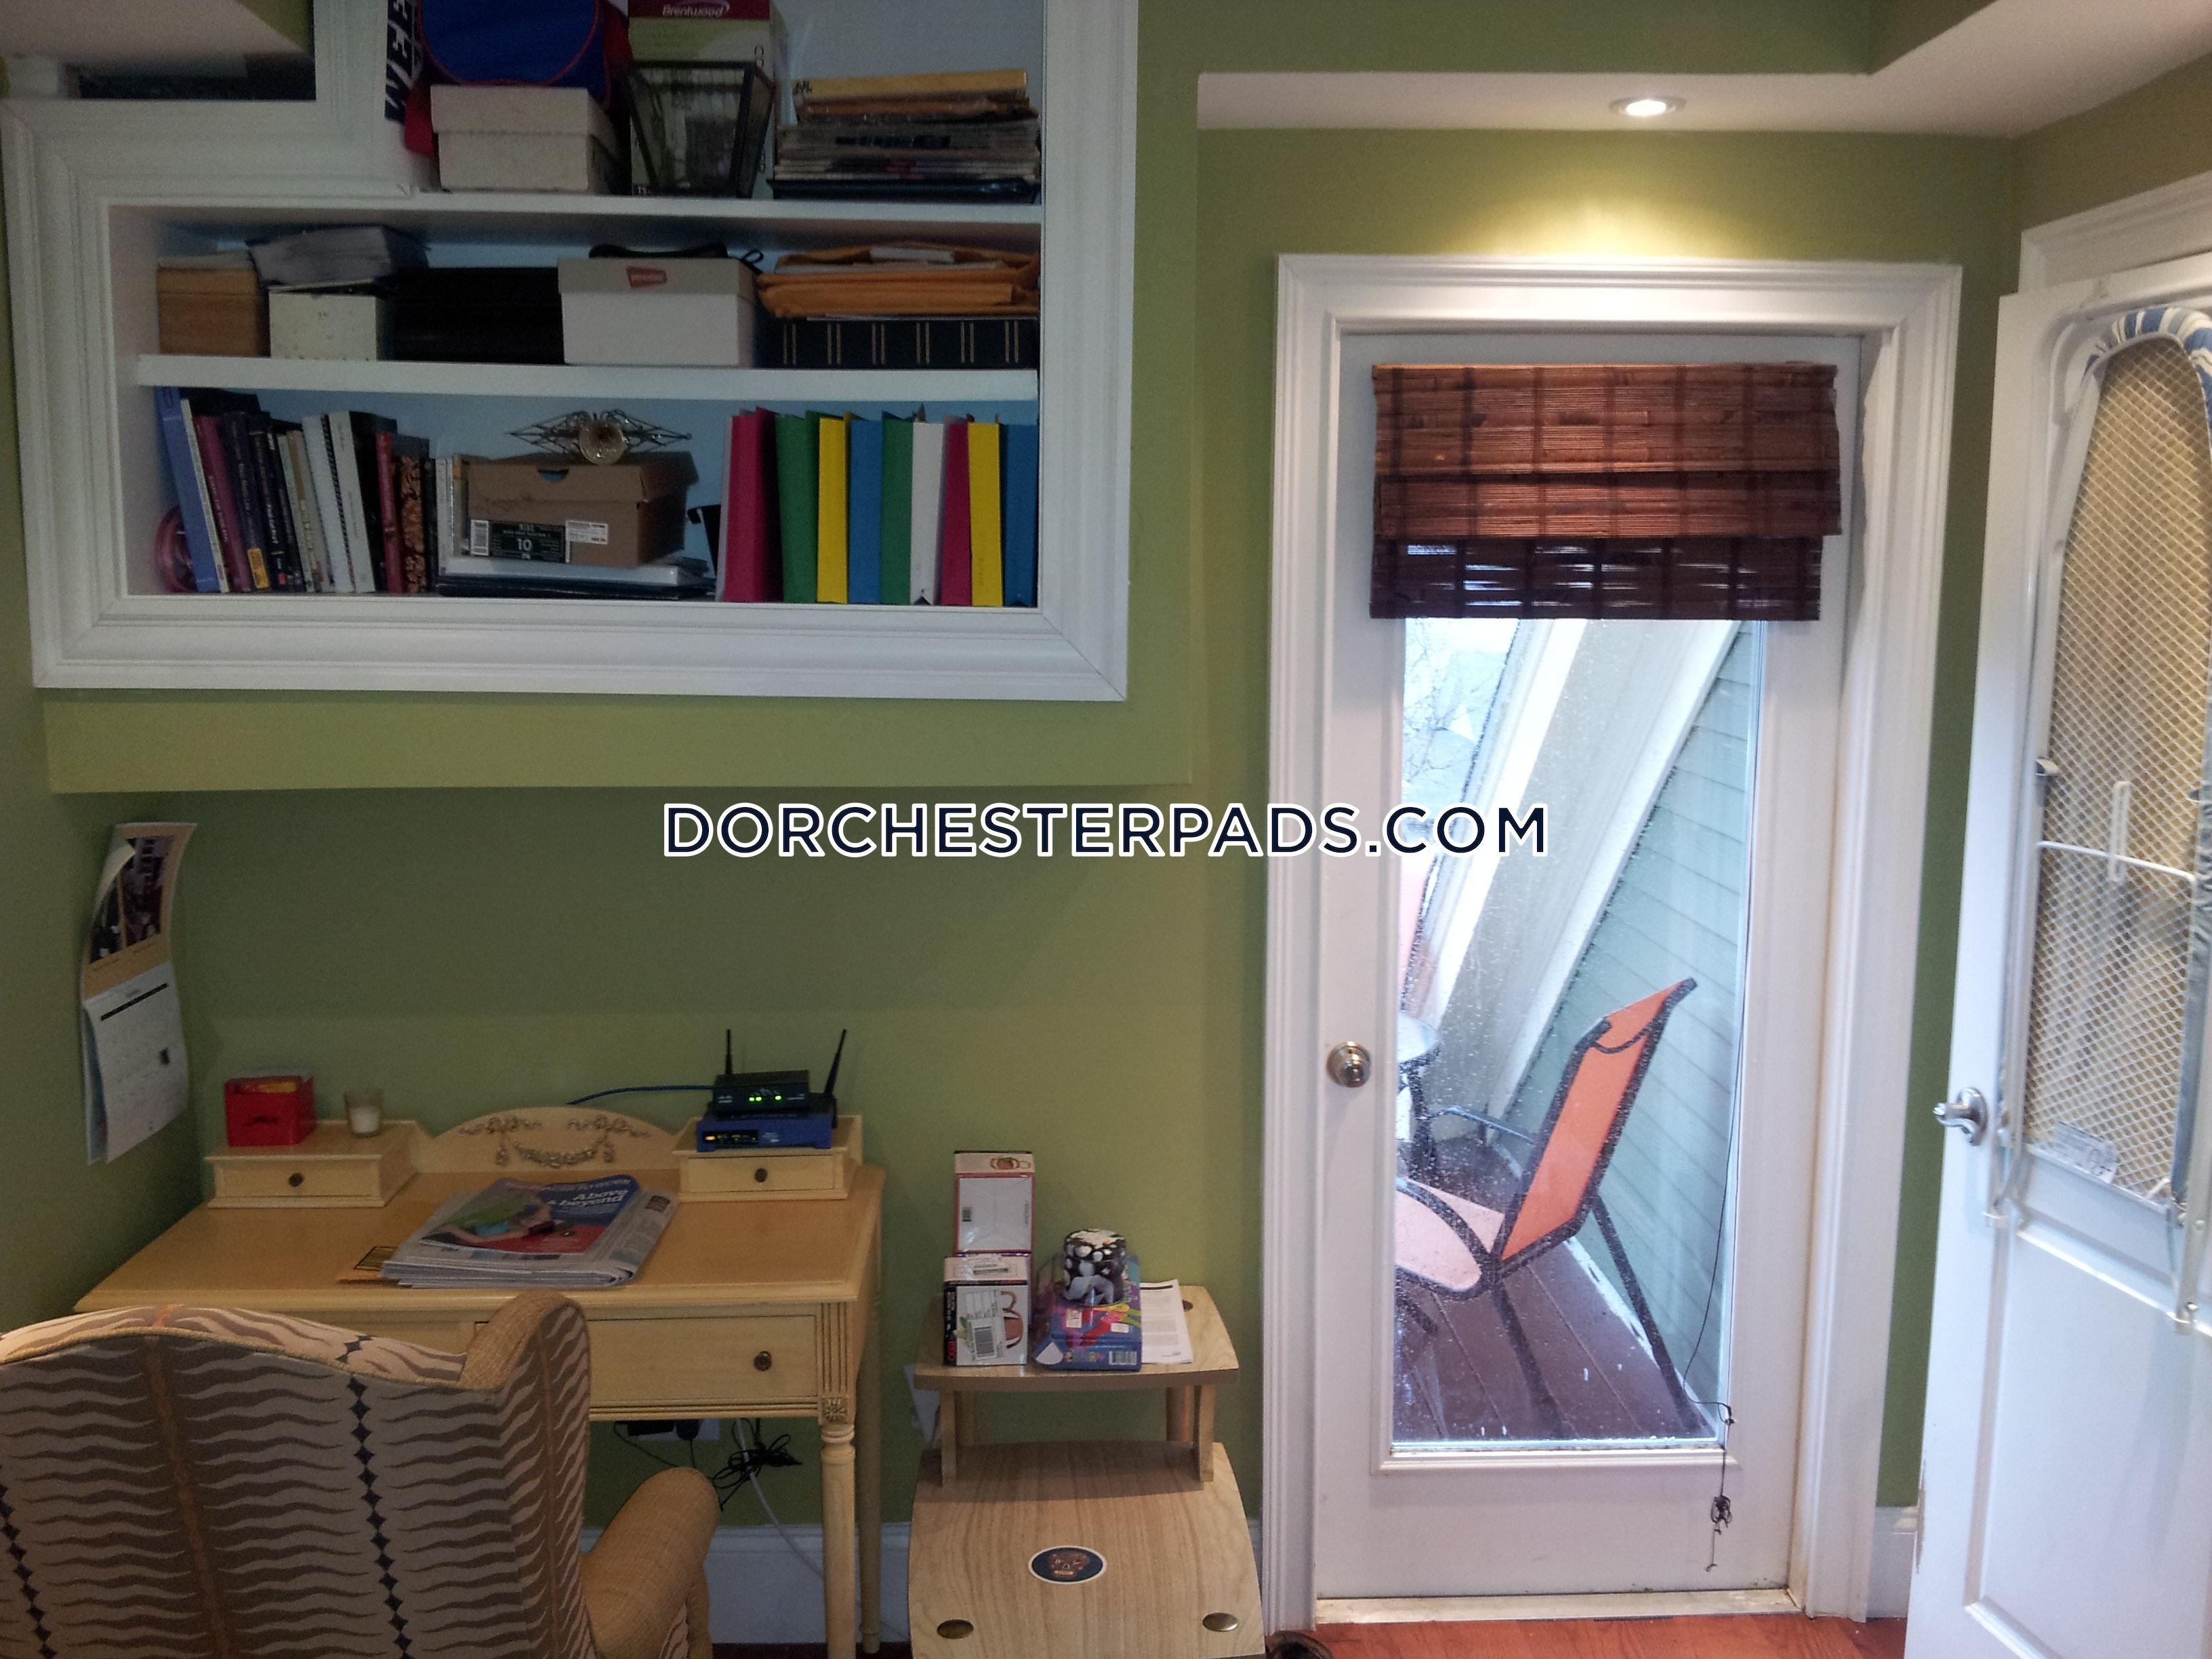 South end apartments 2 beds 1 bath boston dorchester savin 2 beds 1 bath boston dorchester savin hill 2100 amipublicfo Choice Image